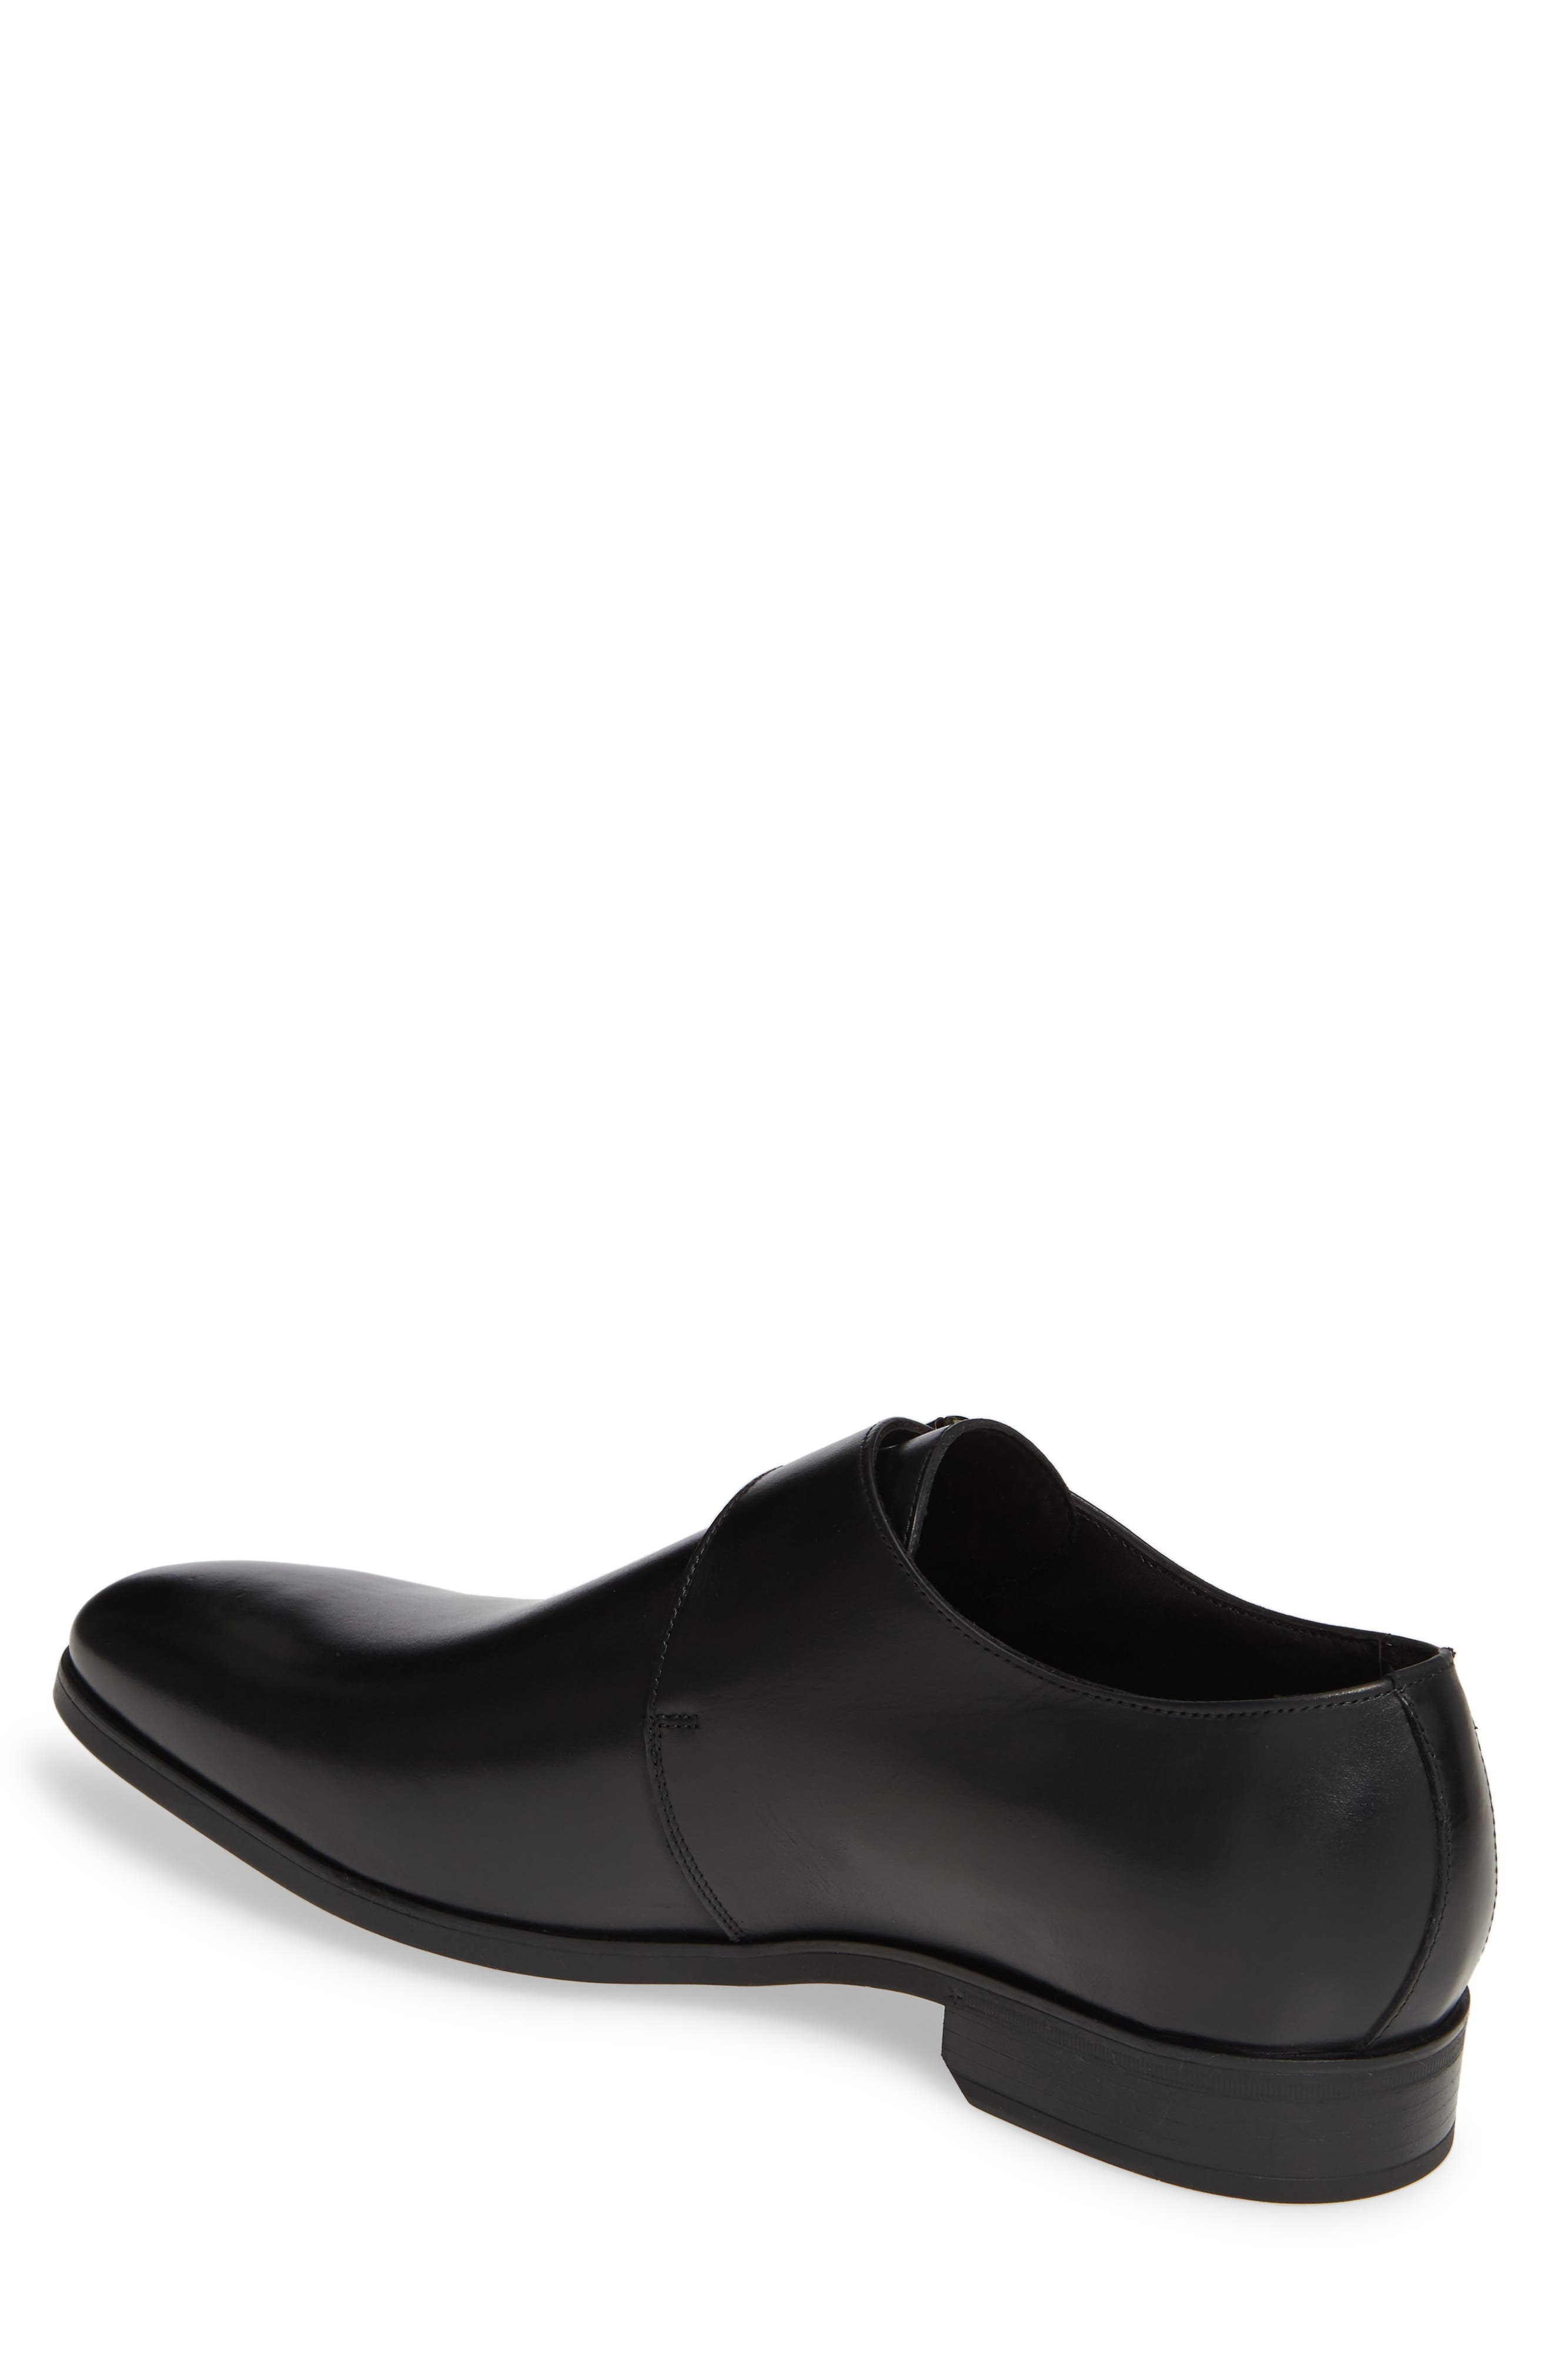 Scarpa Monk Strap Shoe,                             Alternate thumbnail 2, color,                             BLACK LEATHER